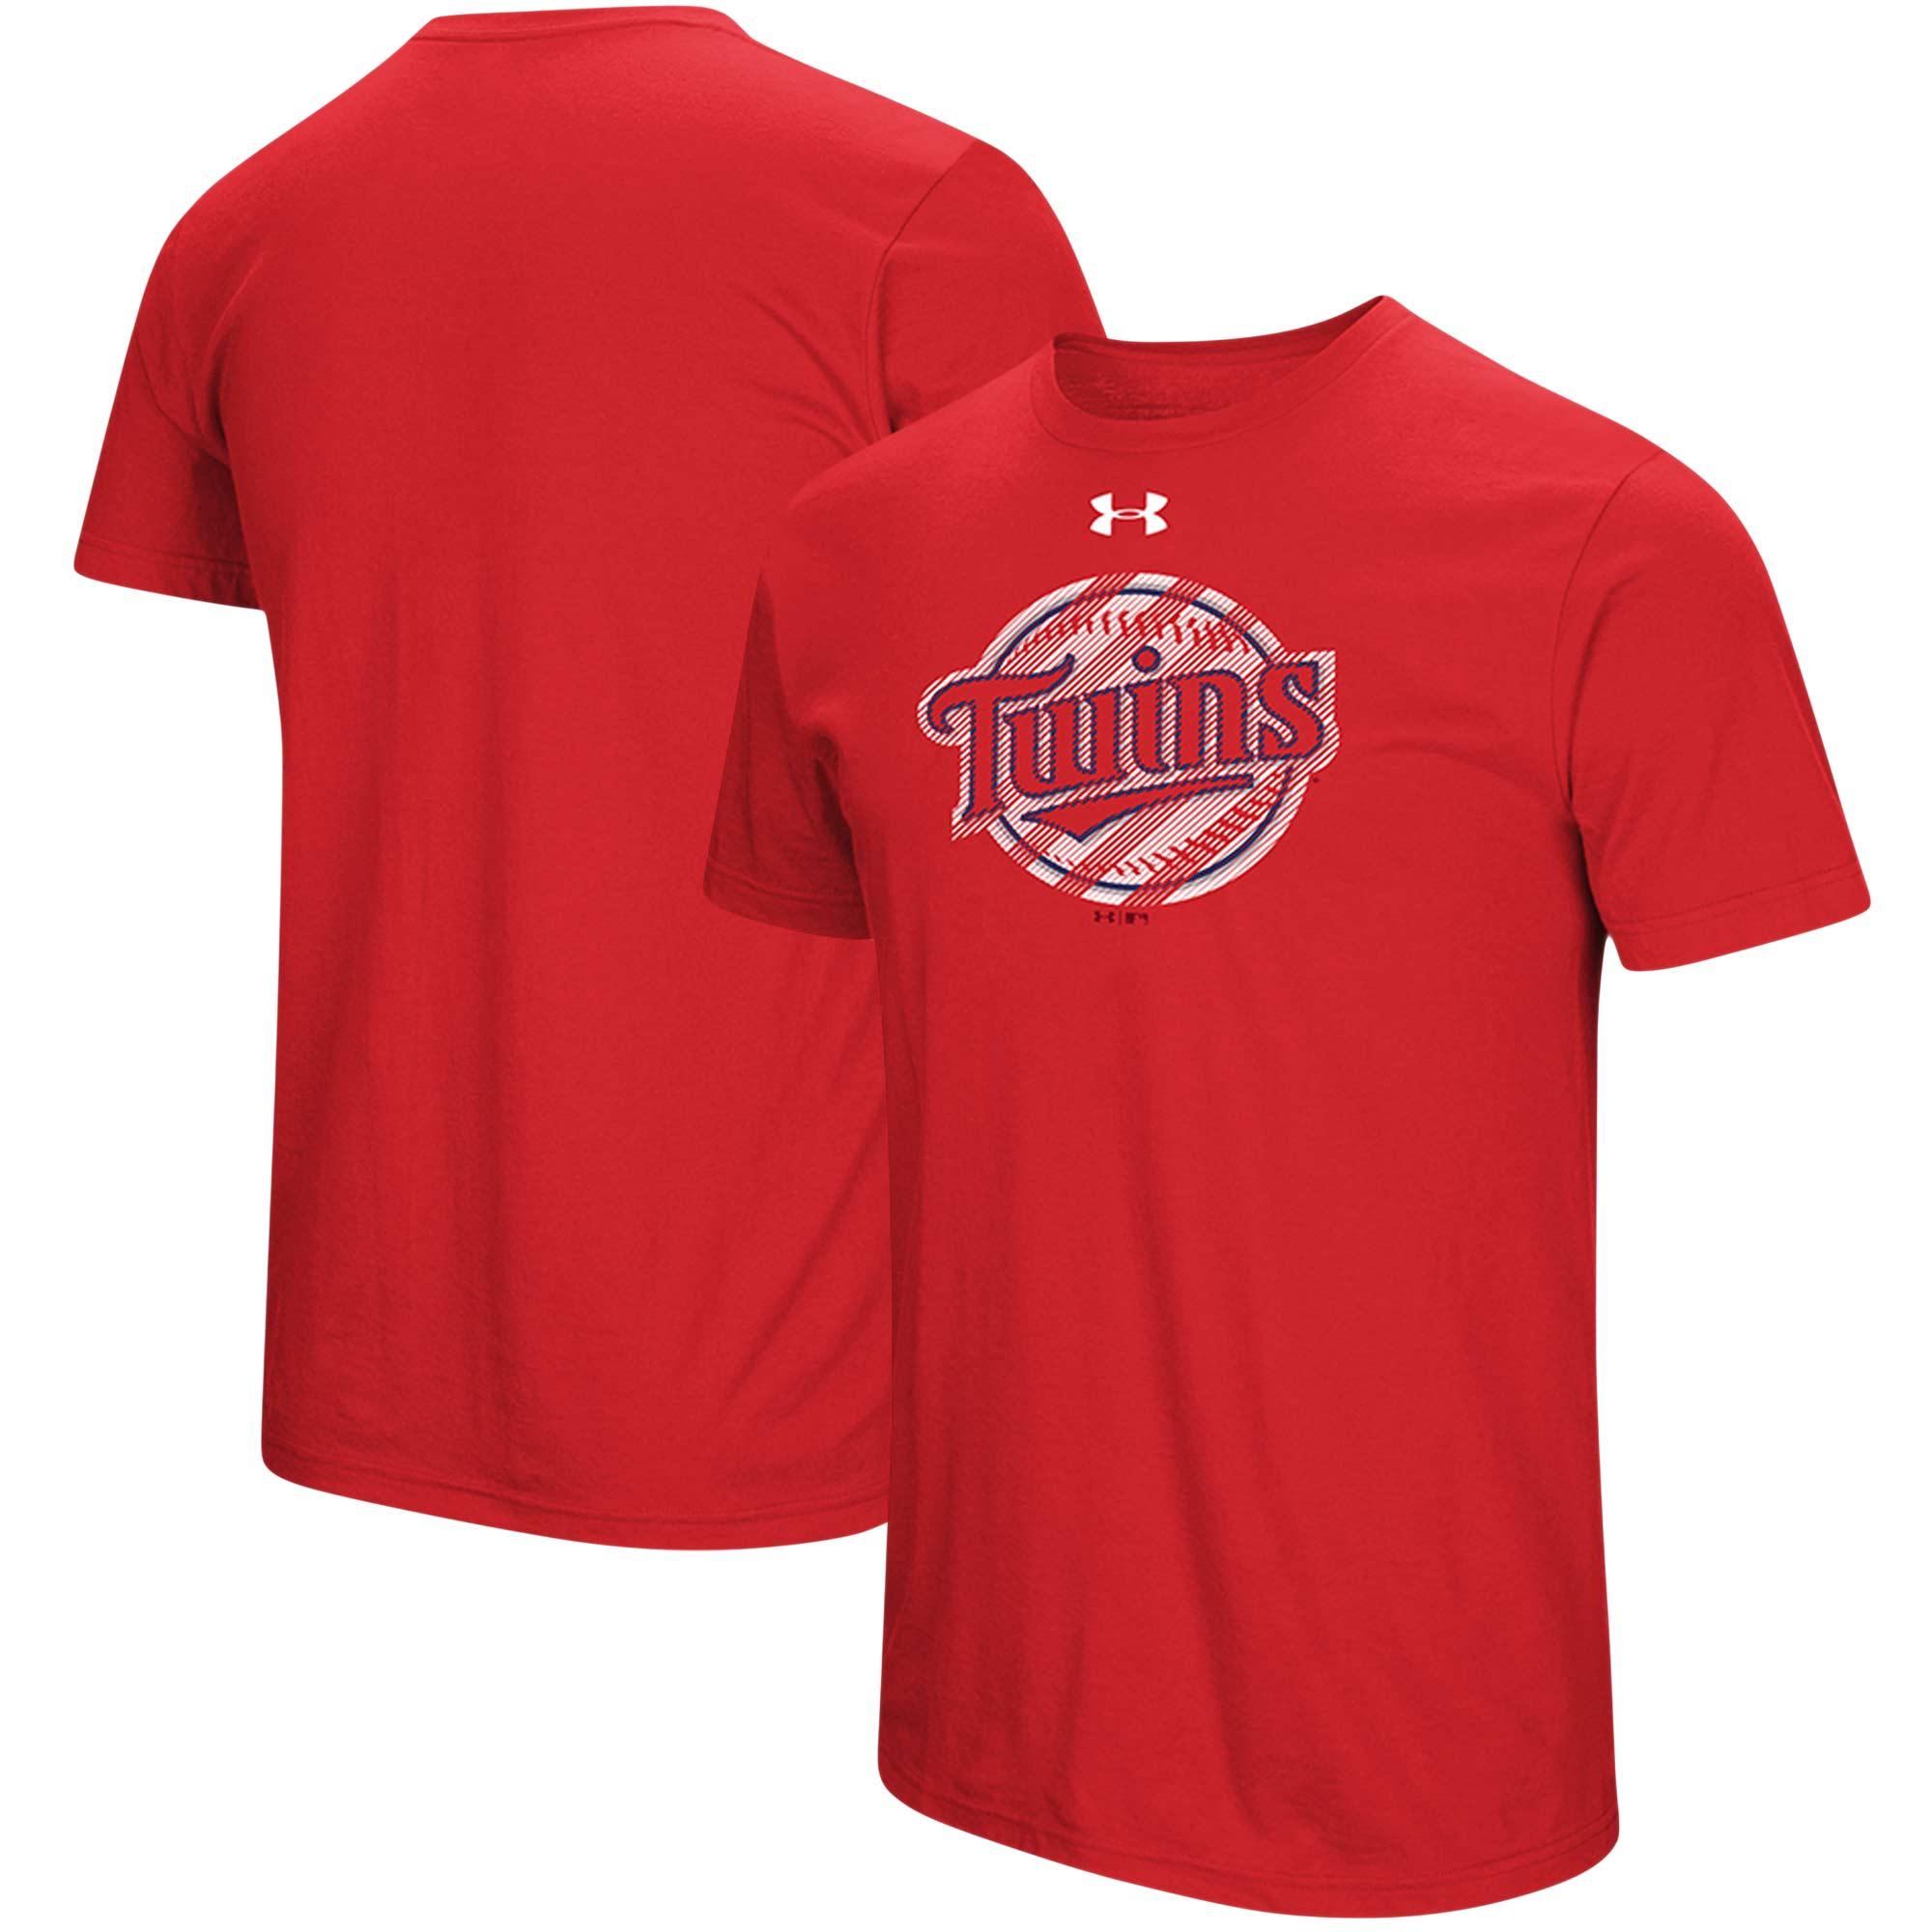 Minnesota Twins Under Armour Passion Alternate Logo T-Shirt - Red